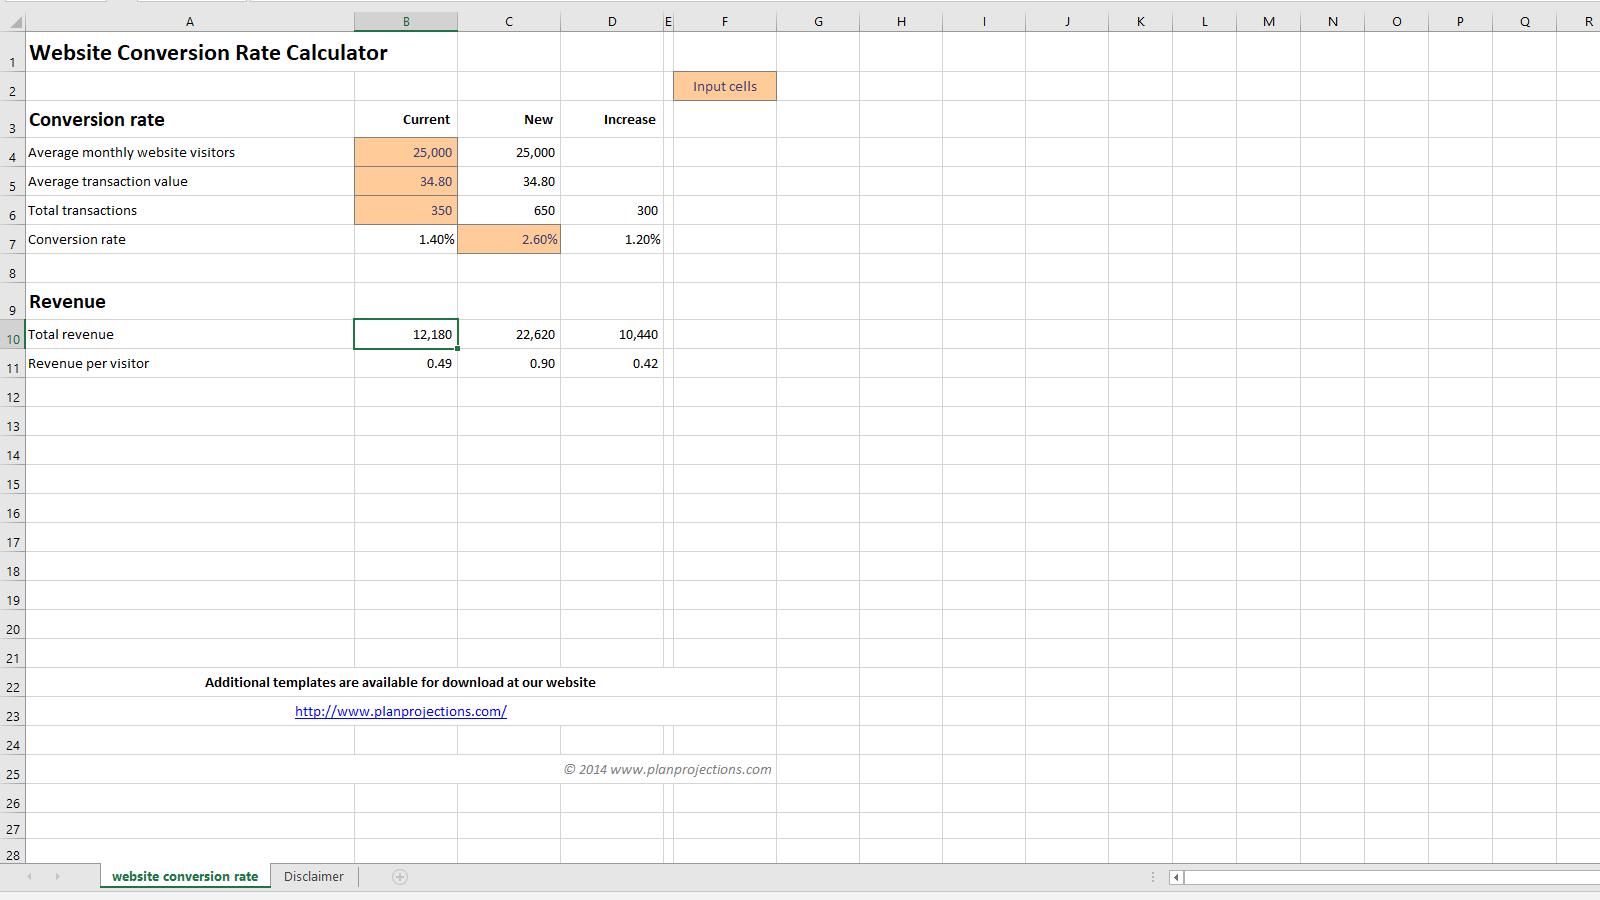 Website Conversion Rate Calculator